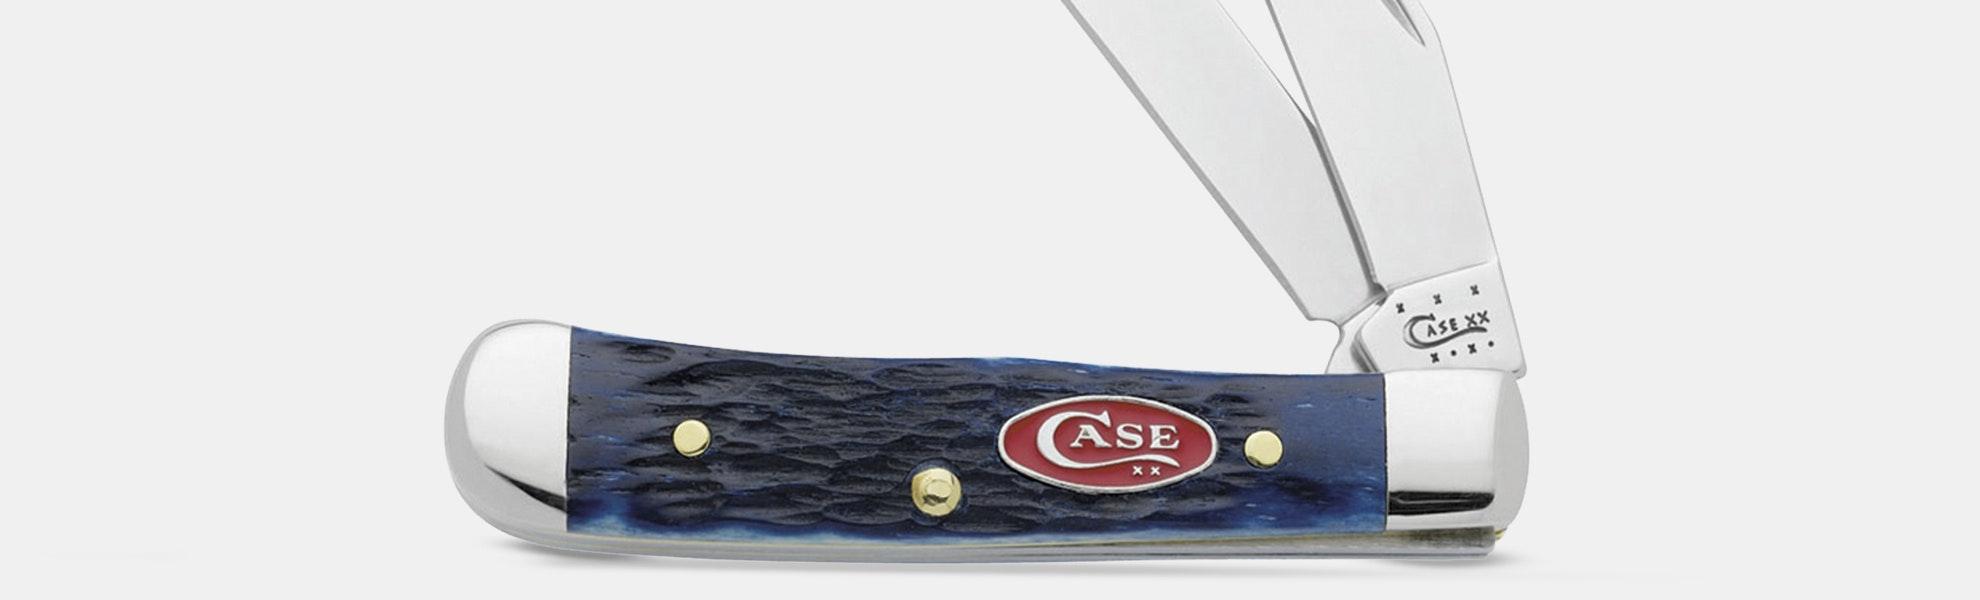 WR Case Pocket Knives: Navy Blue Jigged Bone Family